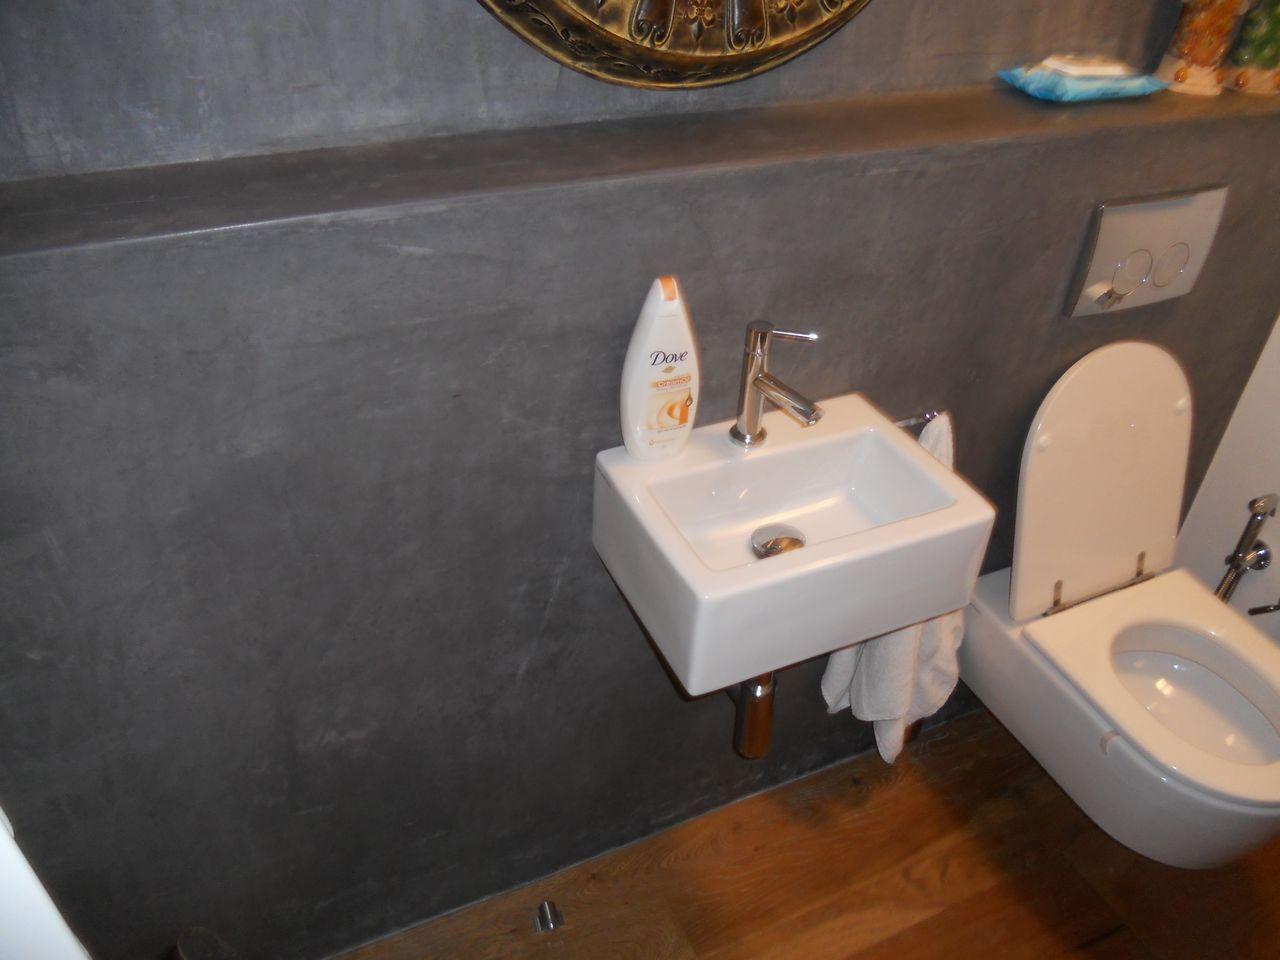 Tadelakt bathroom made by amel kadic -  Tadelakt